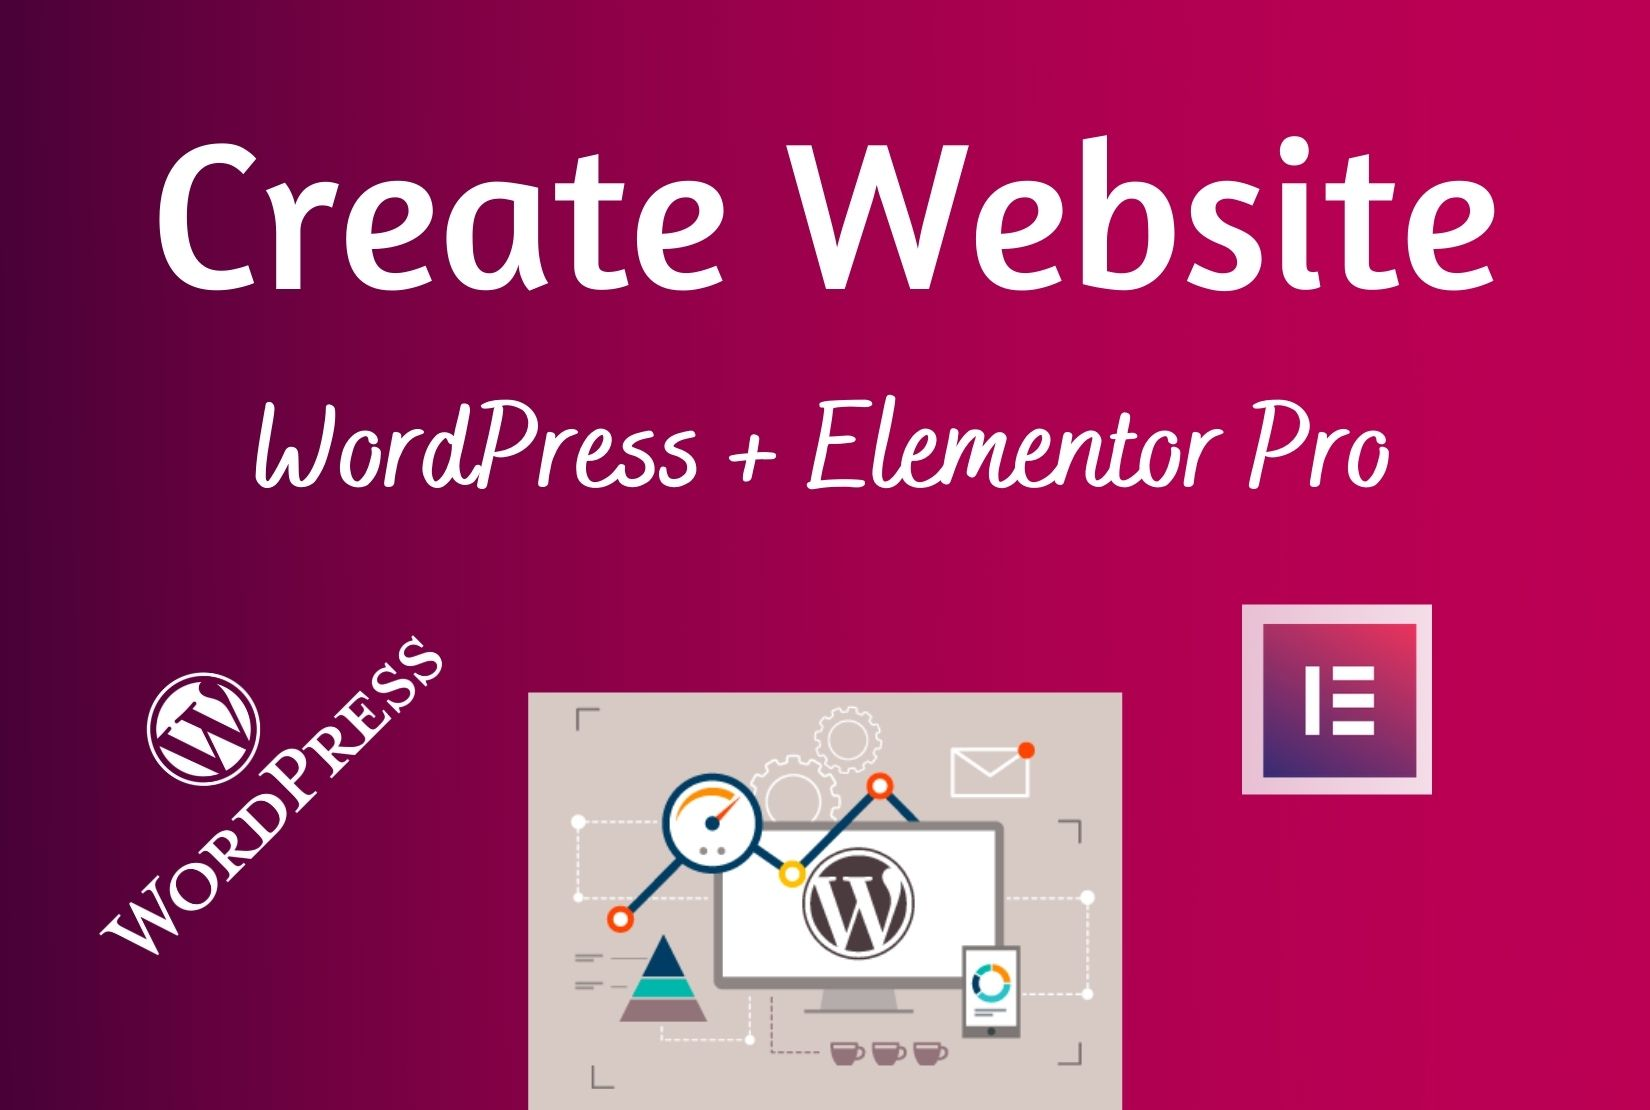 I will make wordpress website by elementor pro in 18 hours